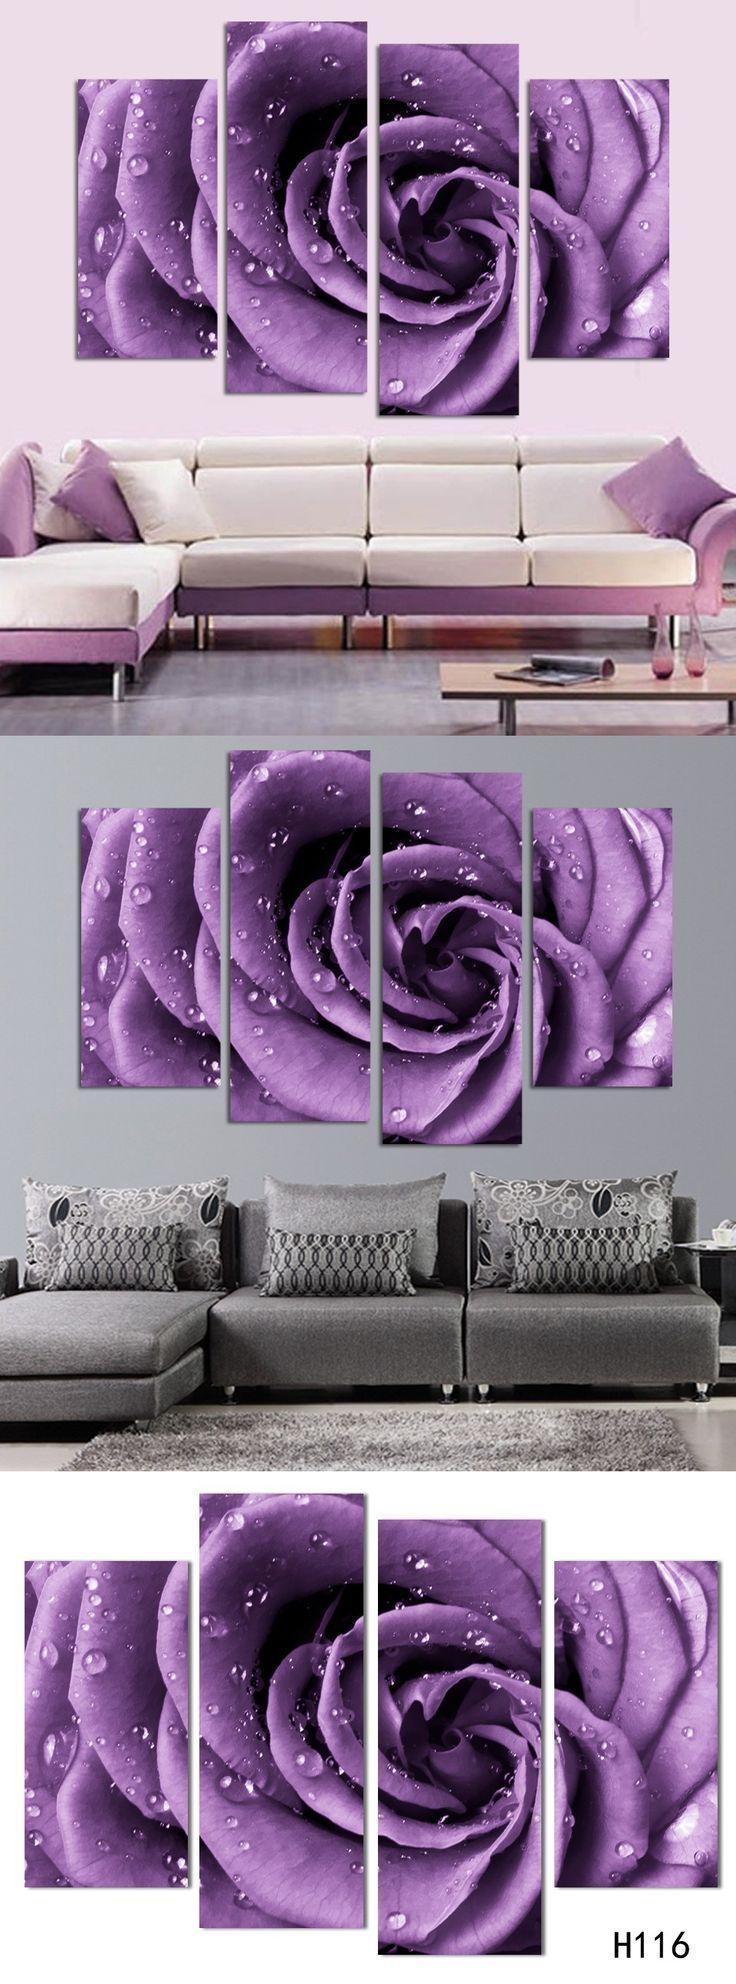 Best 25+ Purple Wall Art Ideas On Pinterest | Purple Printed Art Pertaining To Aubergine Wall Art (View 18 of 20)